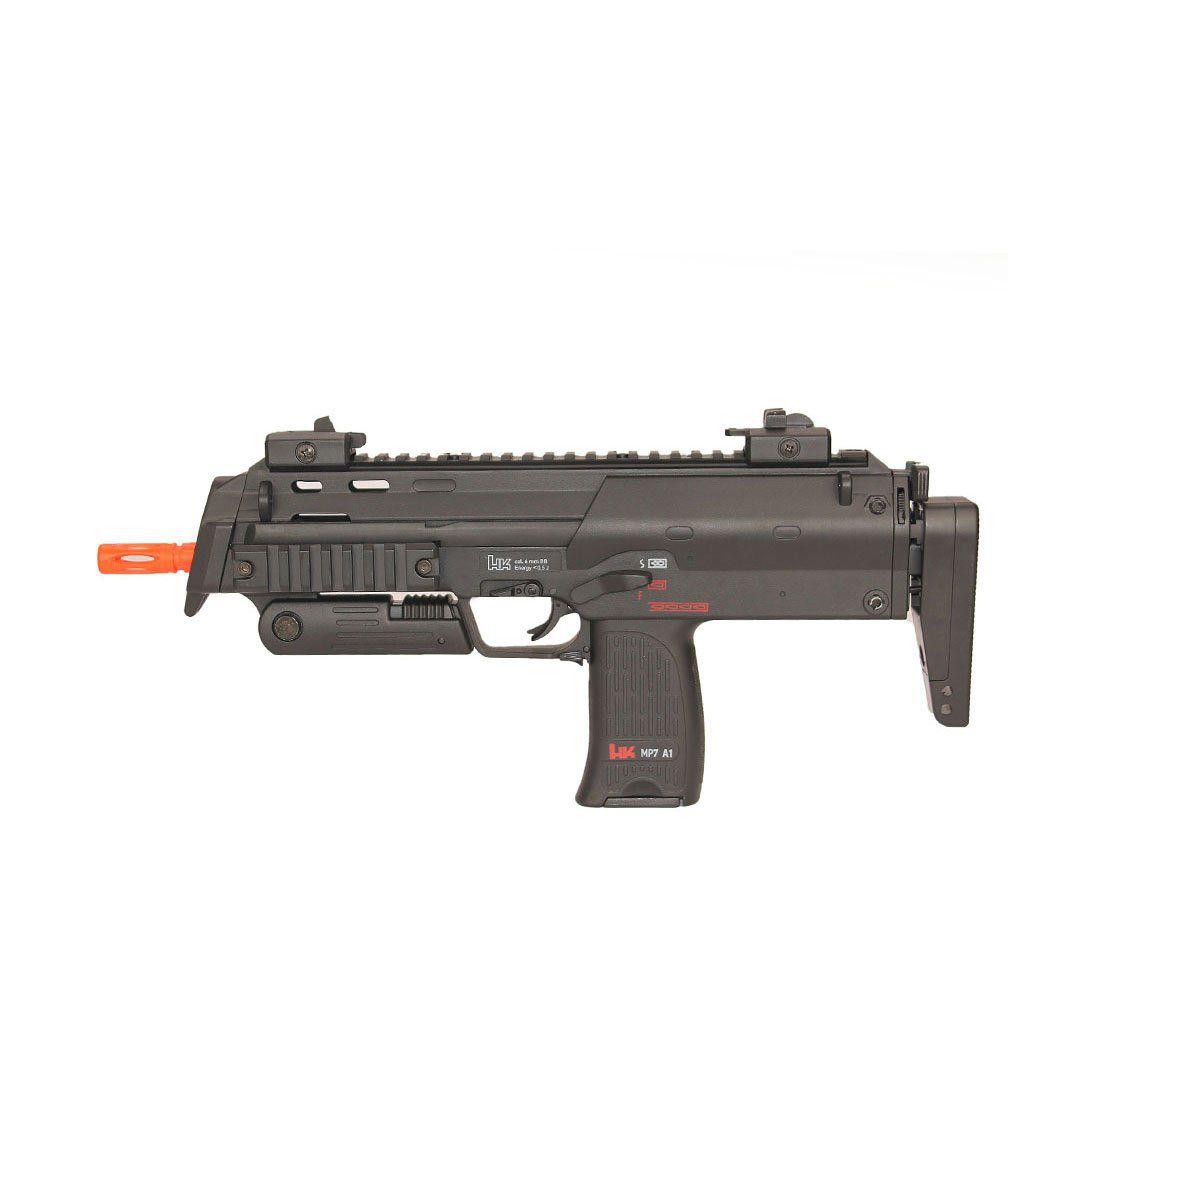 Rifle Airsoft Heckler & Koch Umarex MP7 A1 Elétrico 6mm